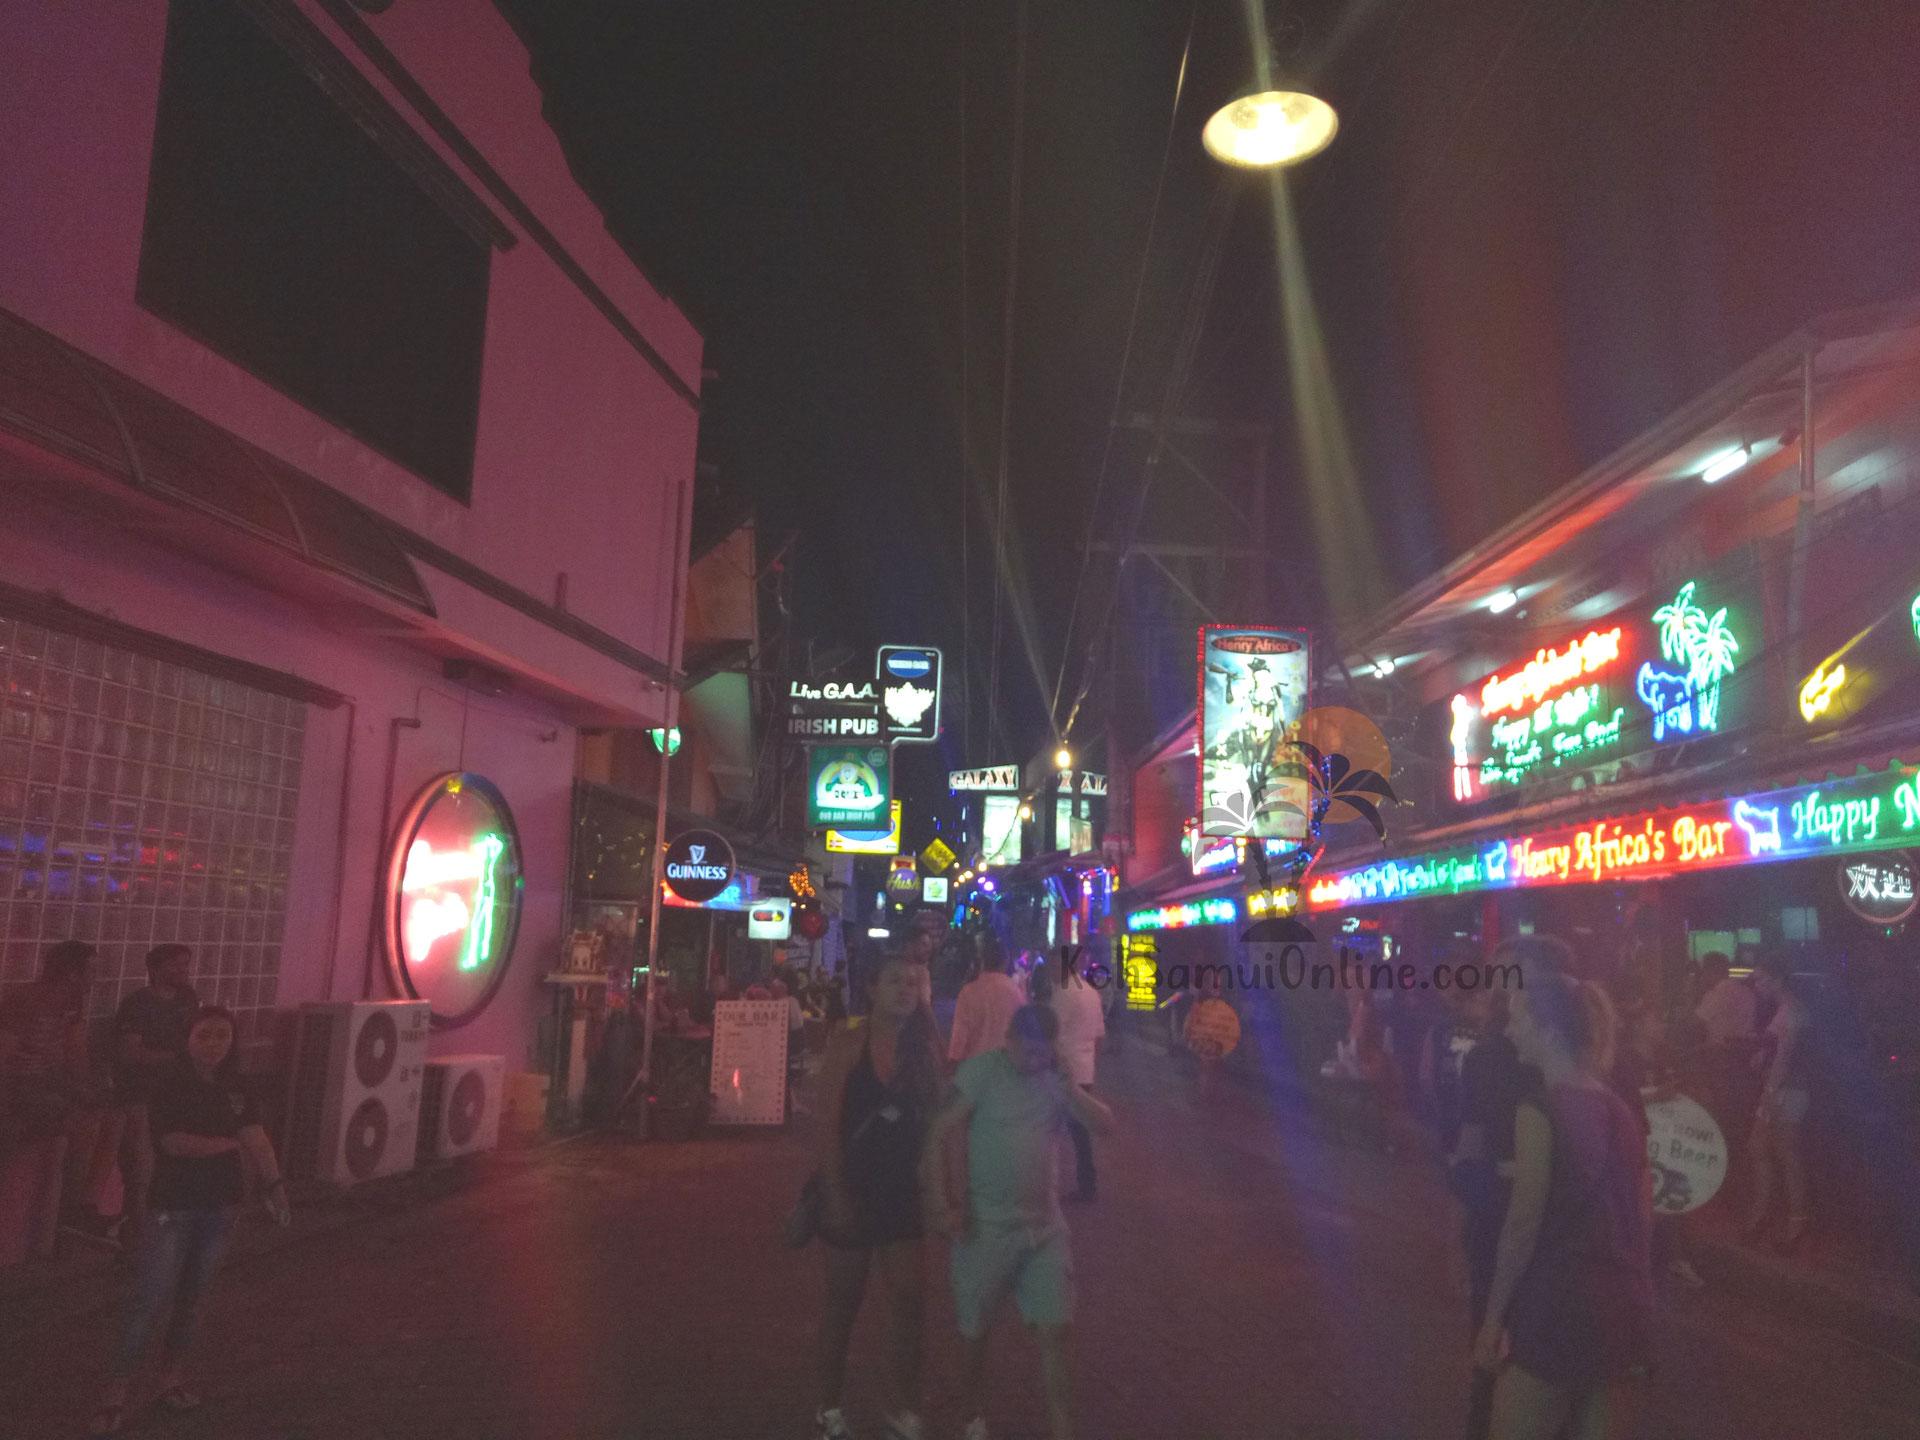 Koh Samui Nightlife - it is so wild - SamuiOnline